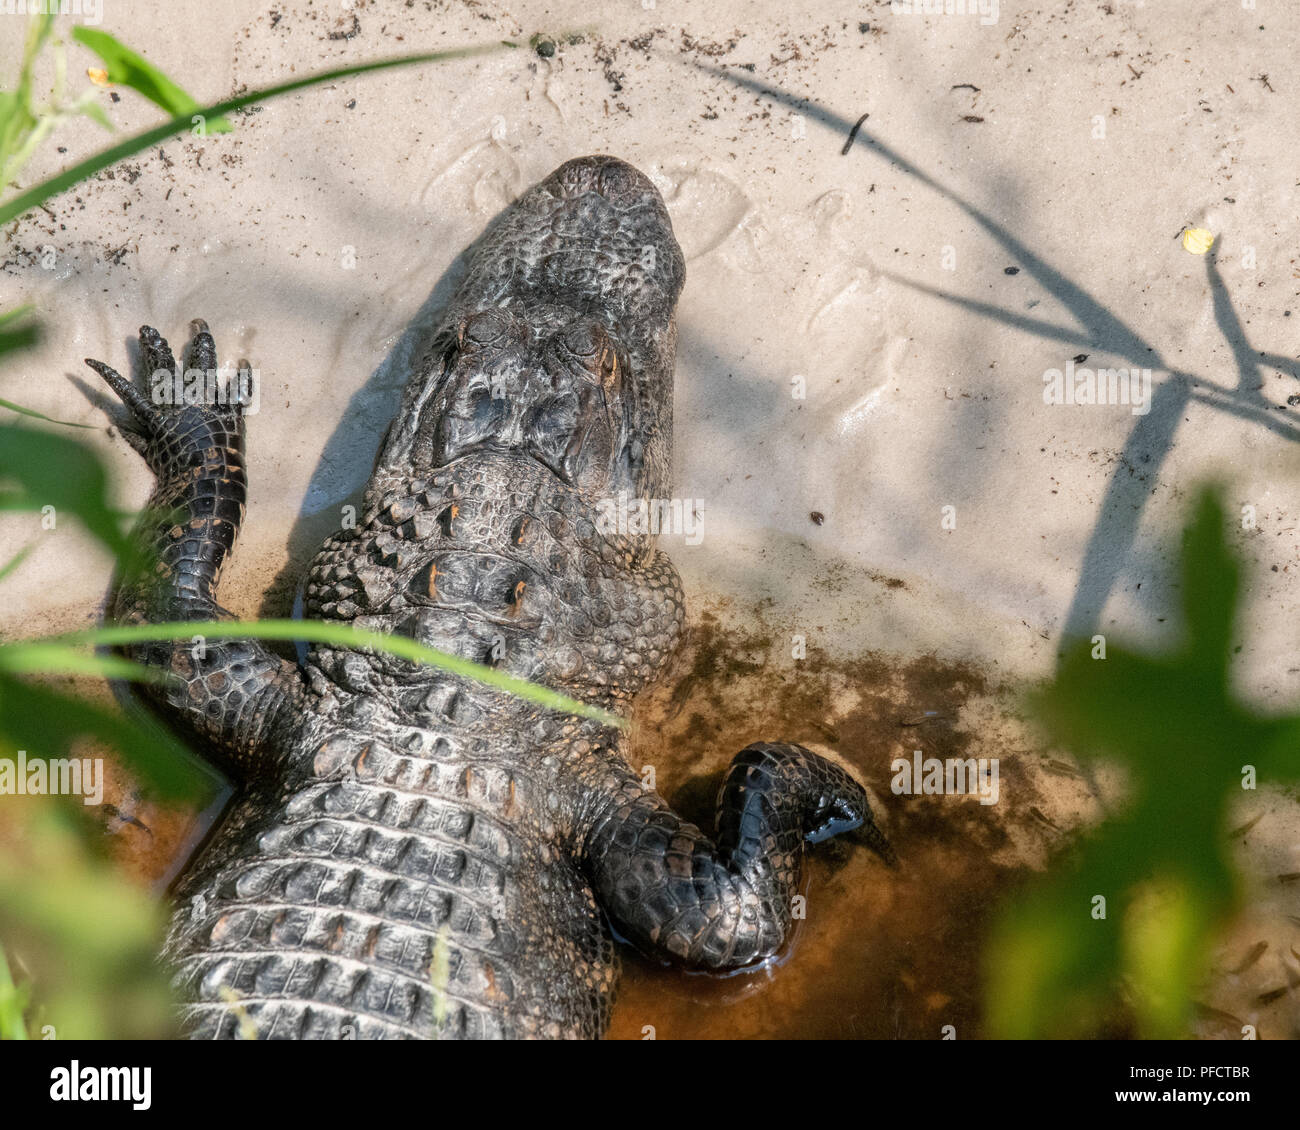 American Alligator feeding in a North Carolina swamp - Shalotte - near South Carolina - Stock Image